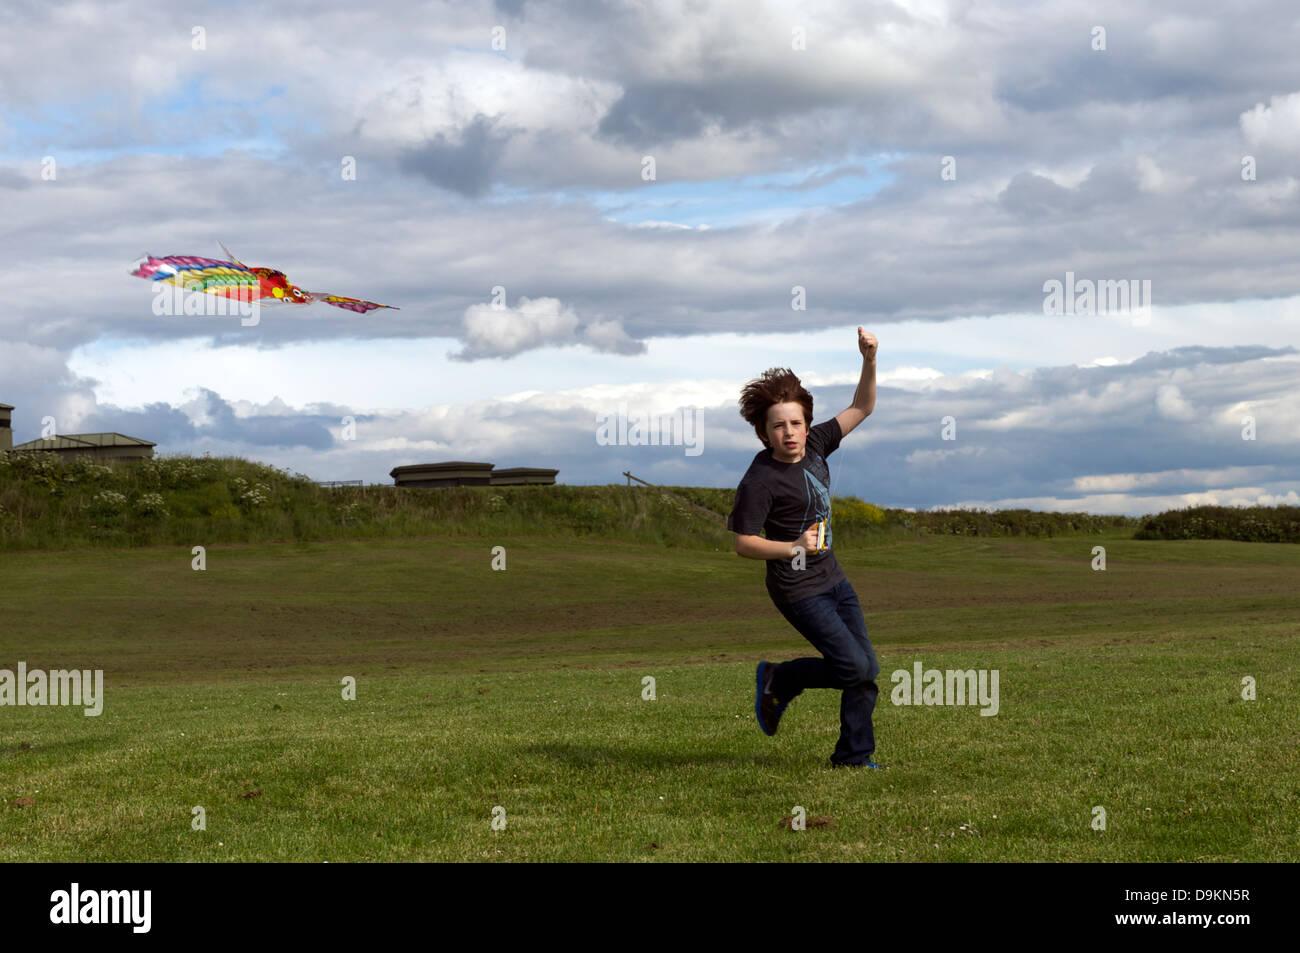 Boy flying kite - Stock Image